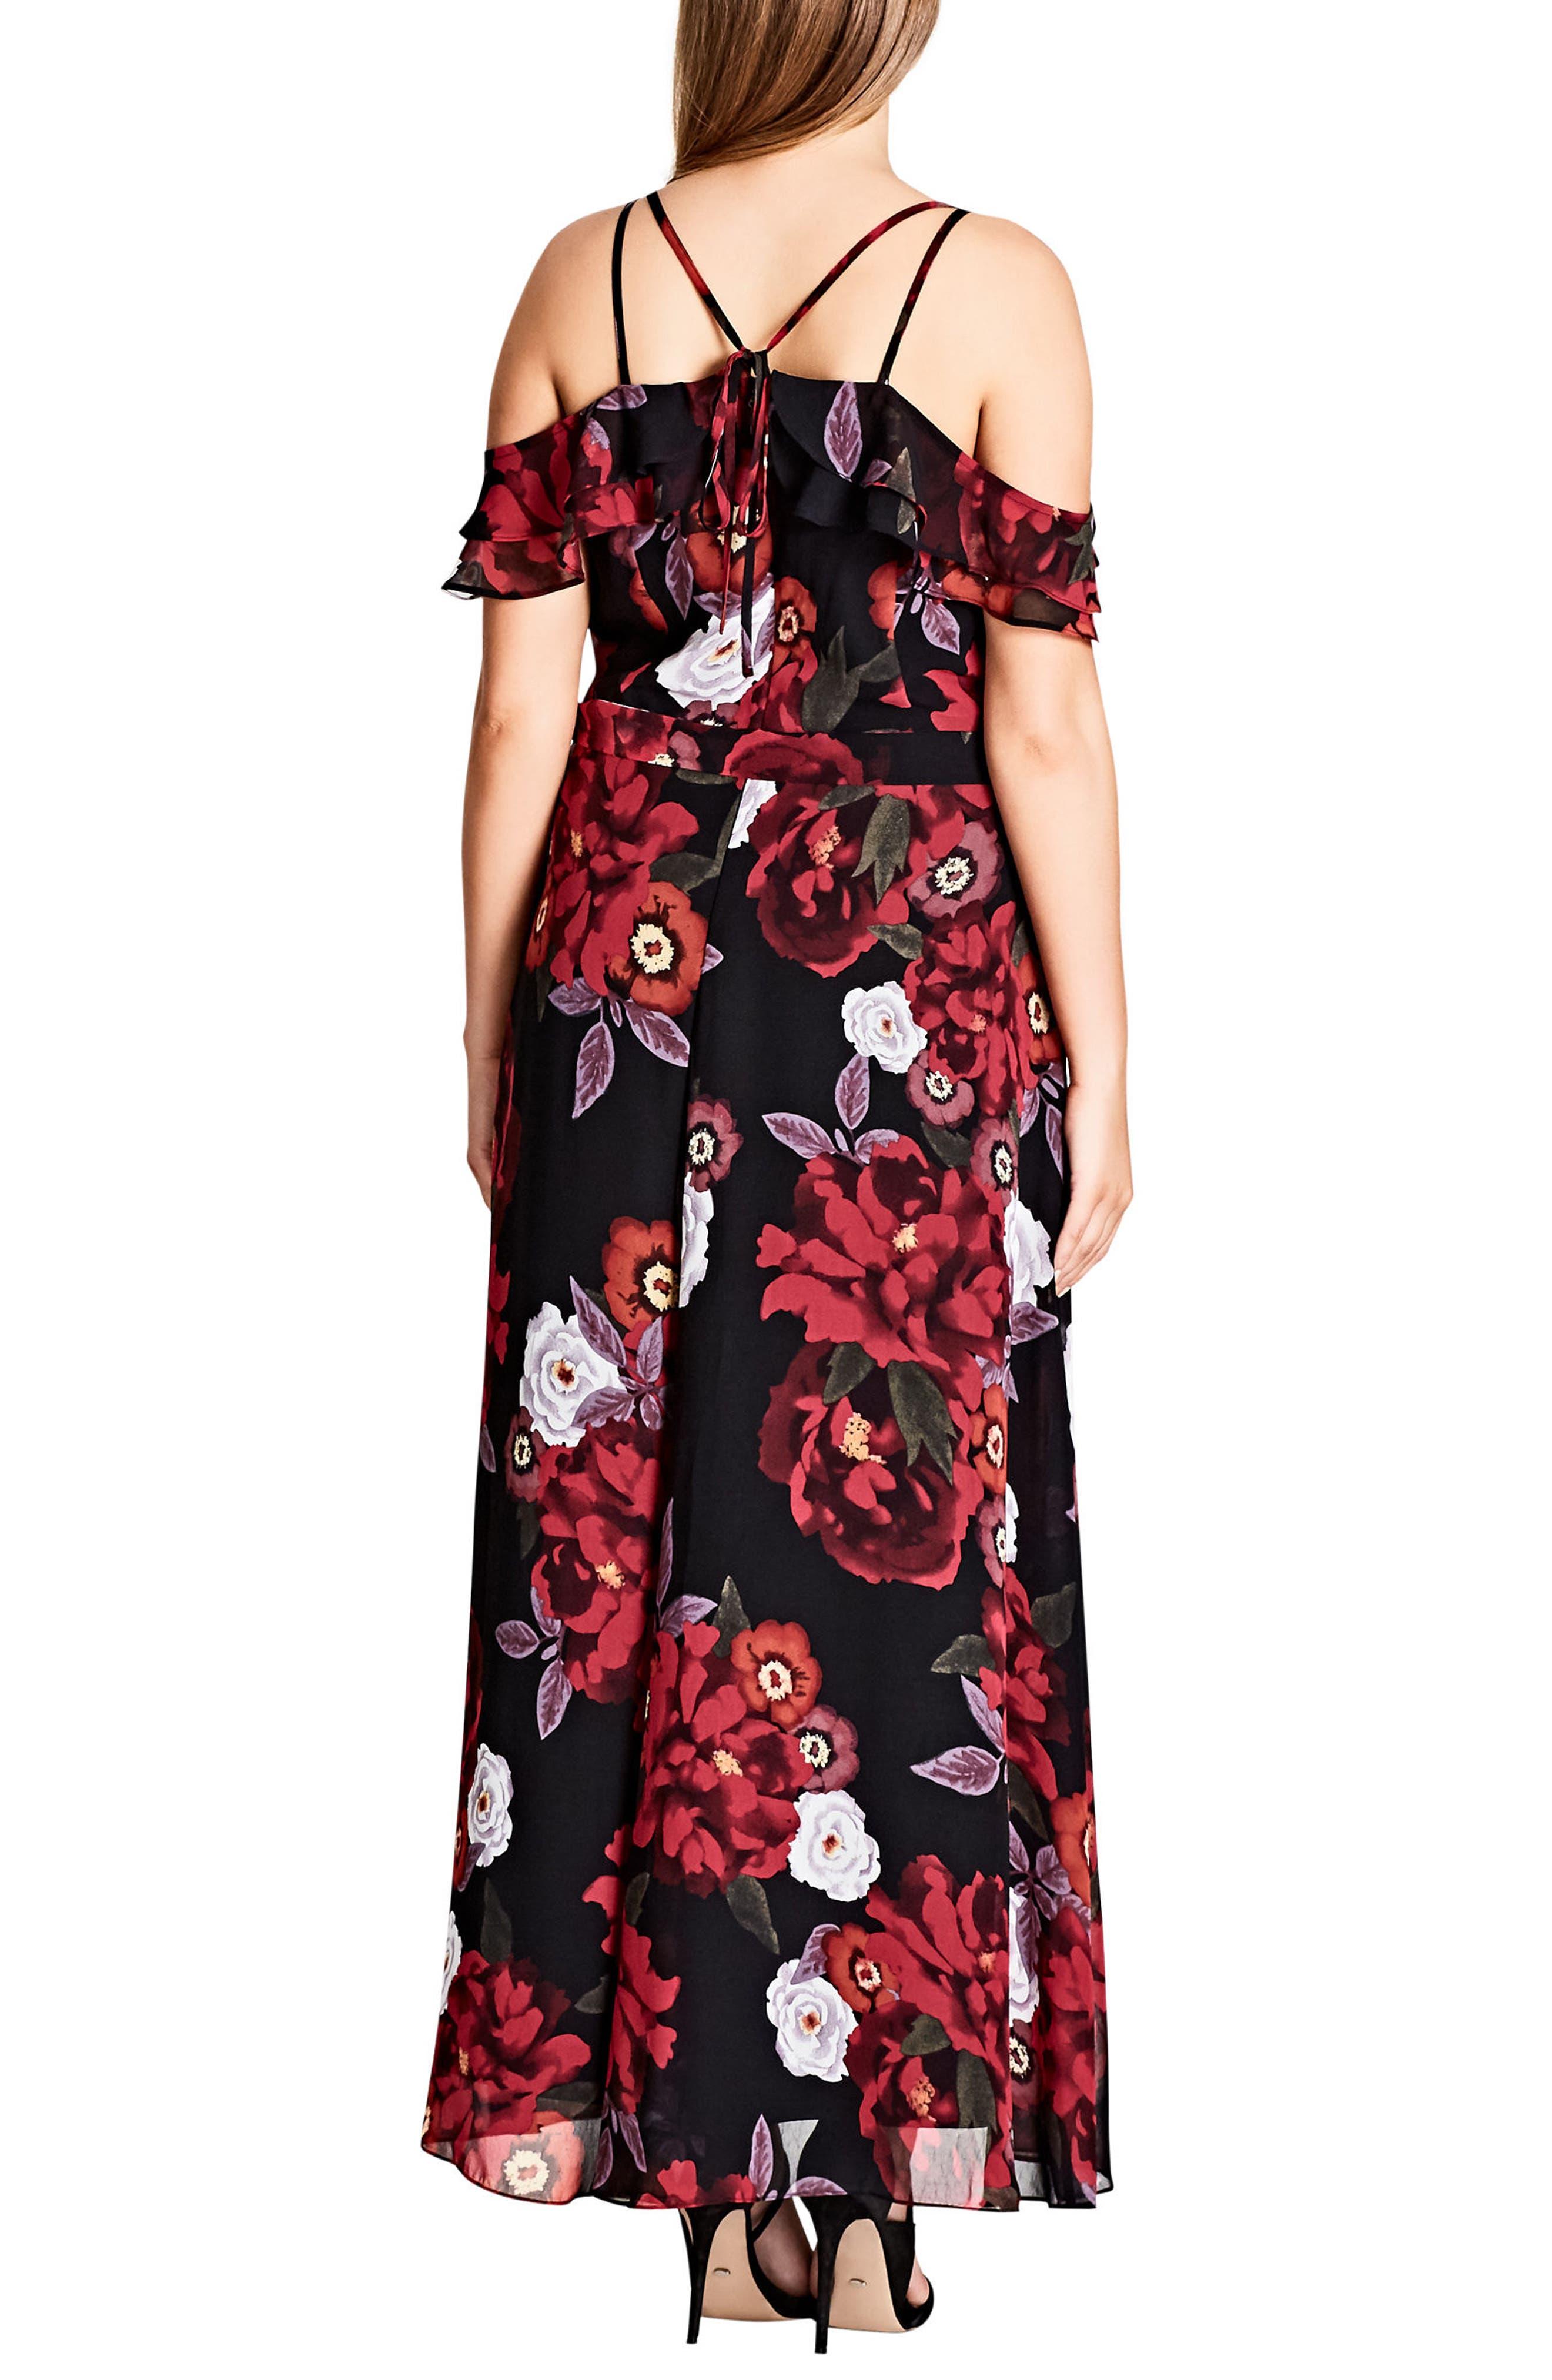 Chic City Rich Rose Maxi Dress,                             Alternate thumbnail 2, color,                             001